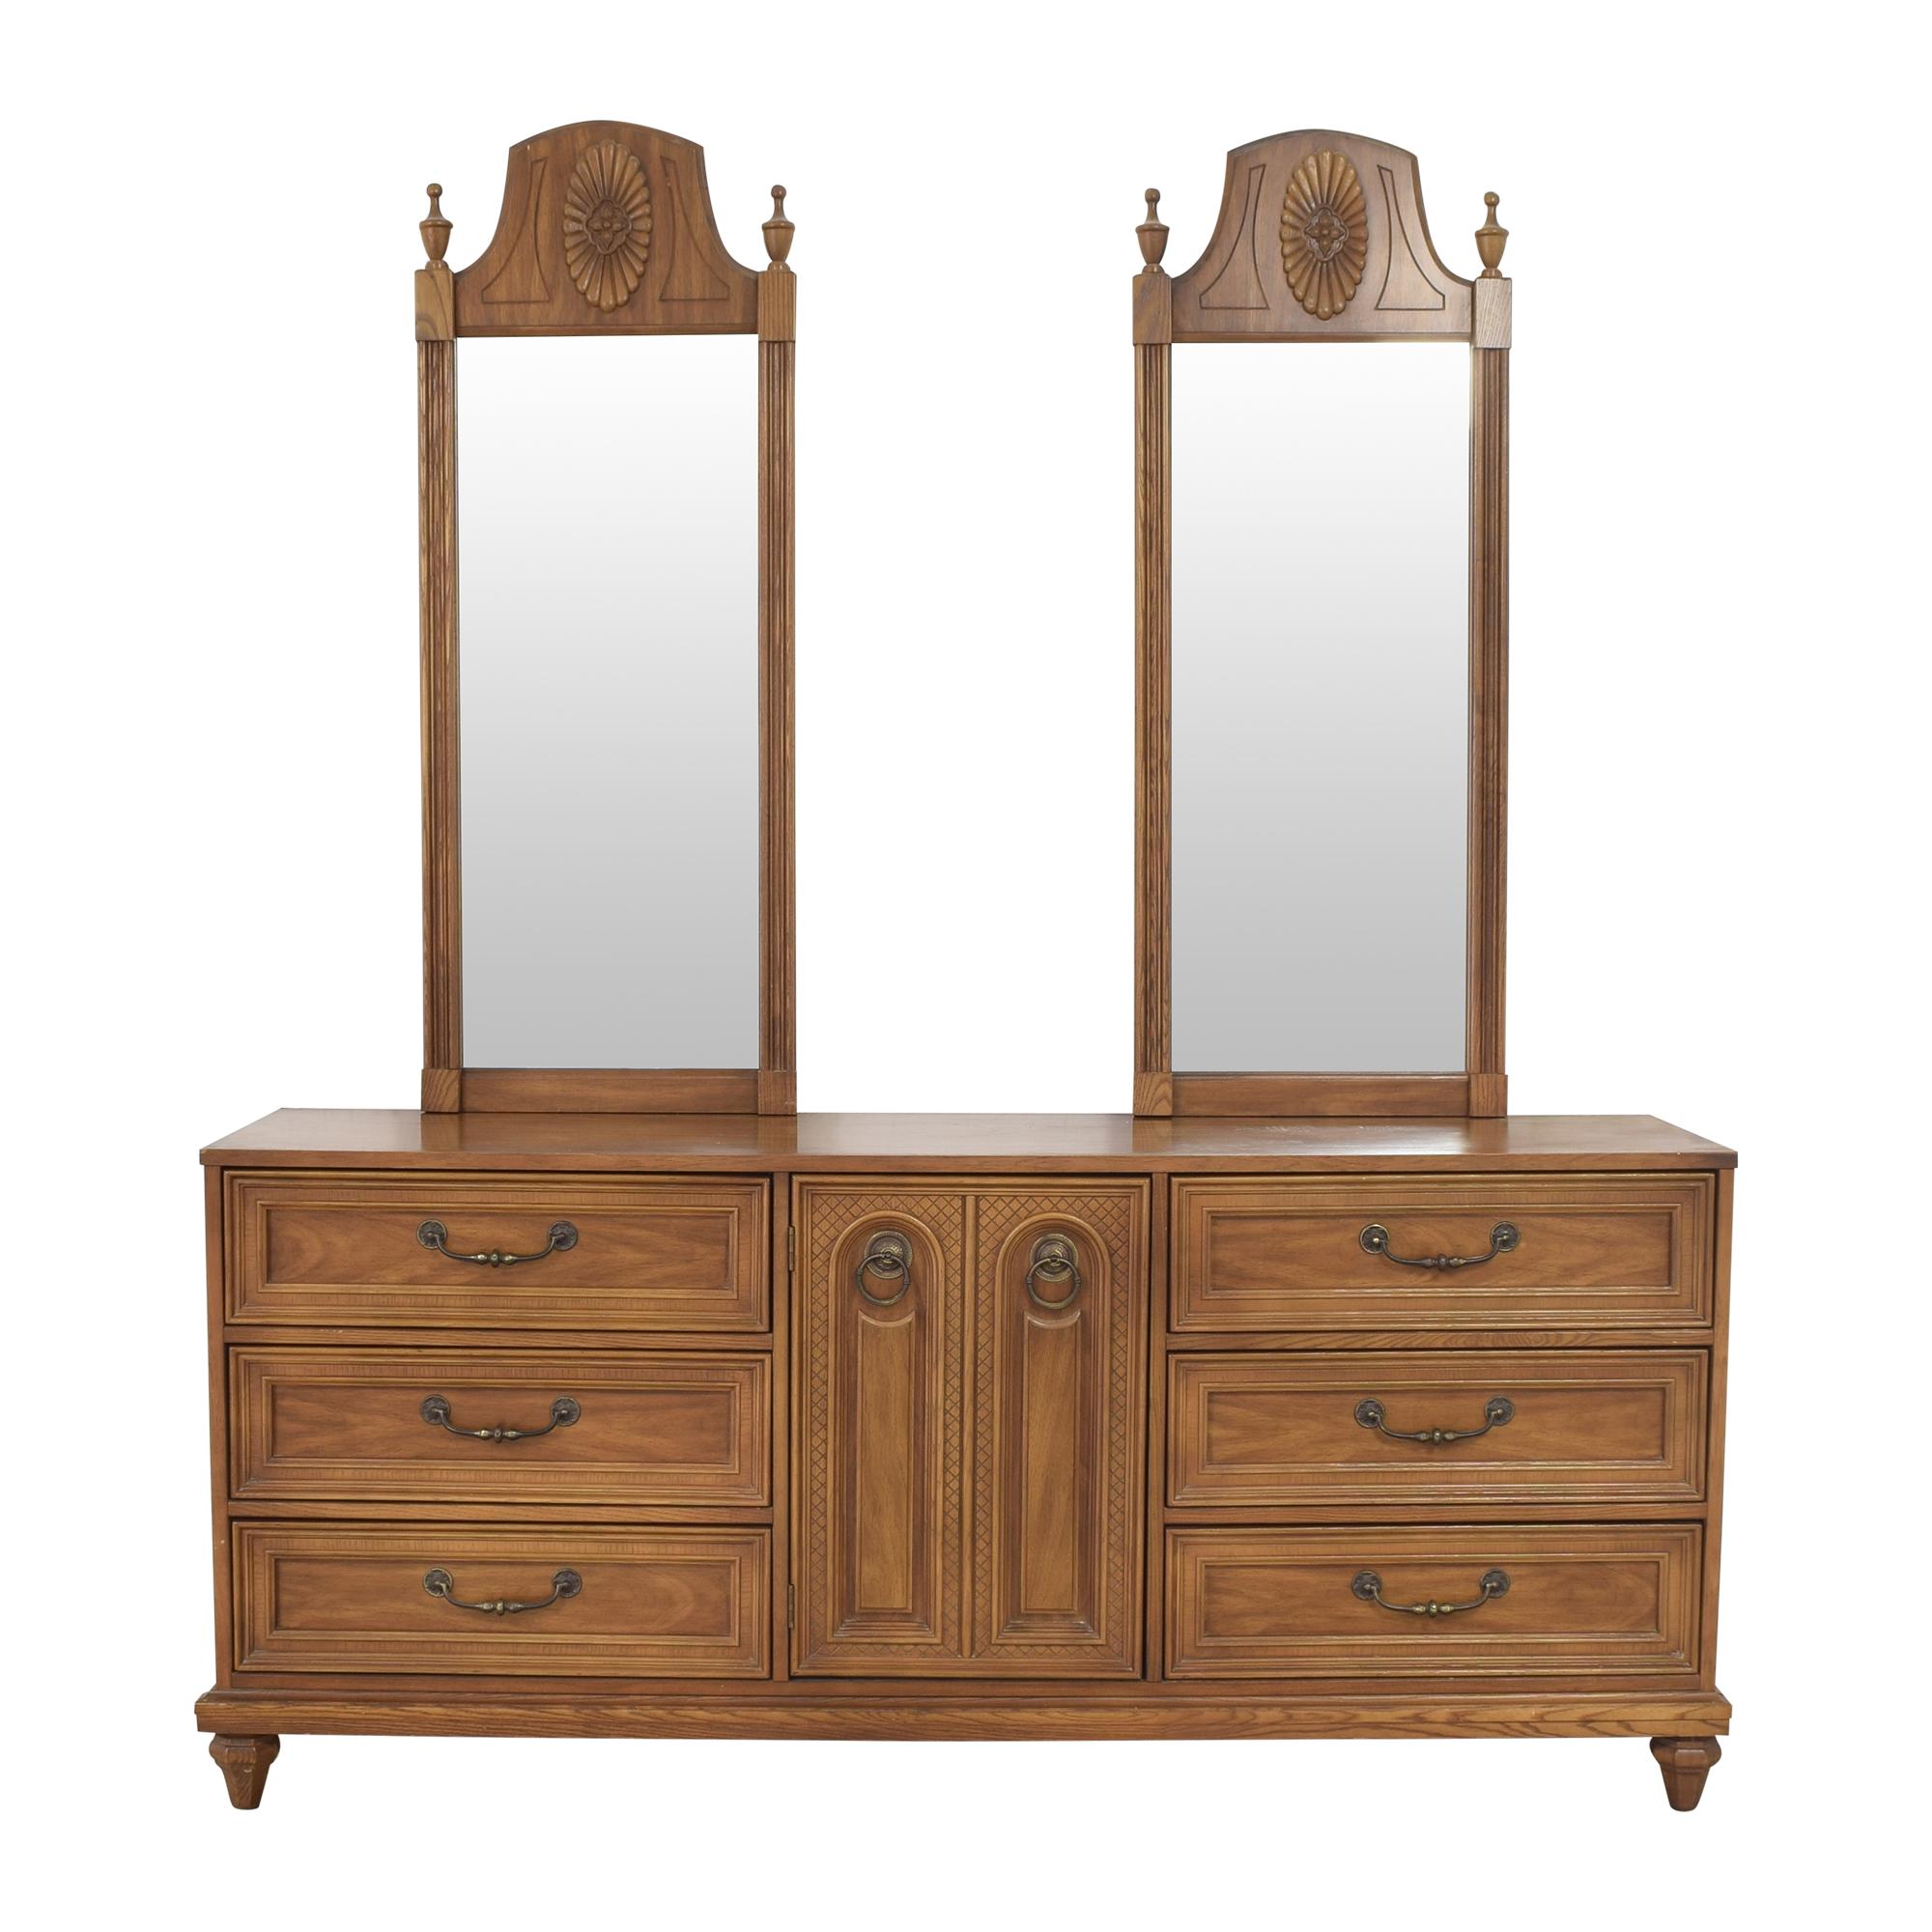 Bassett Furniture Bassett Furniture Cortese Triple Dresser with Mirrors Storage